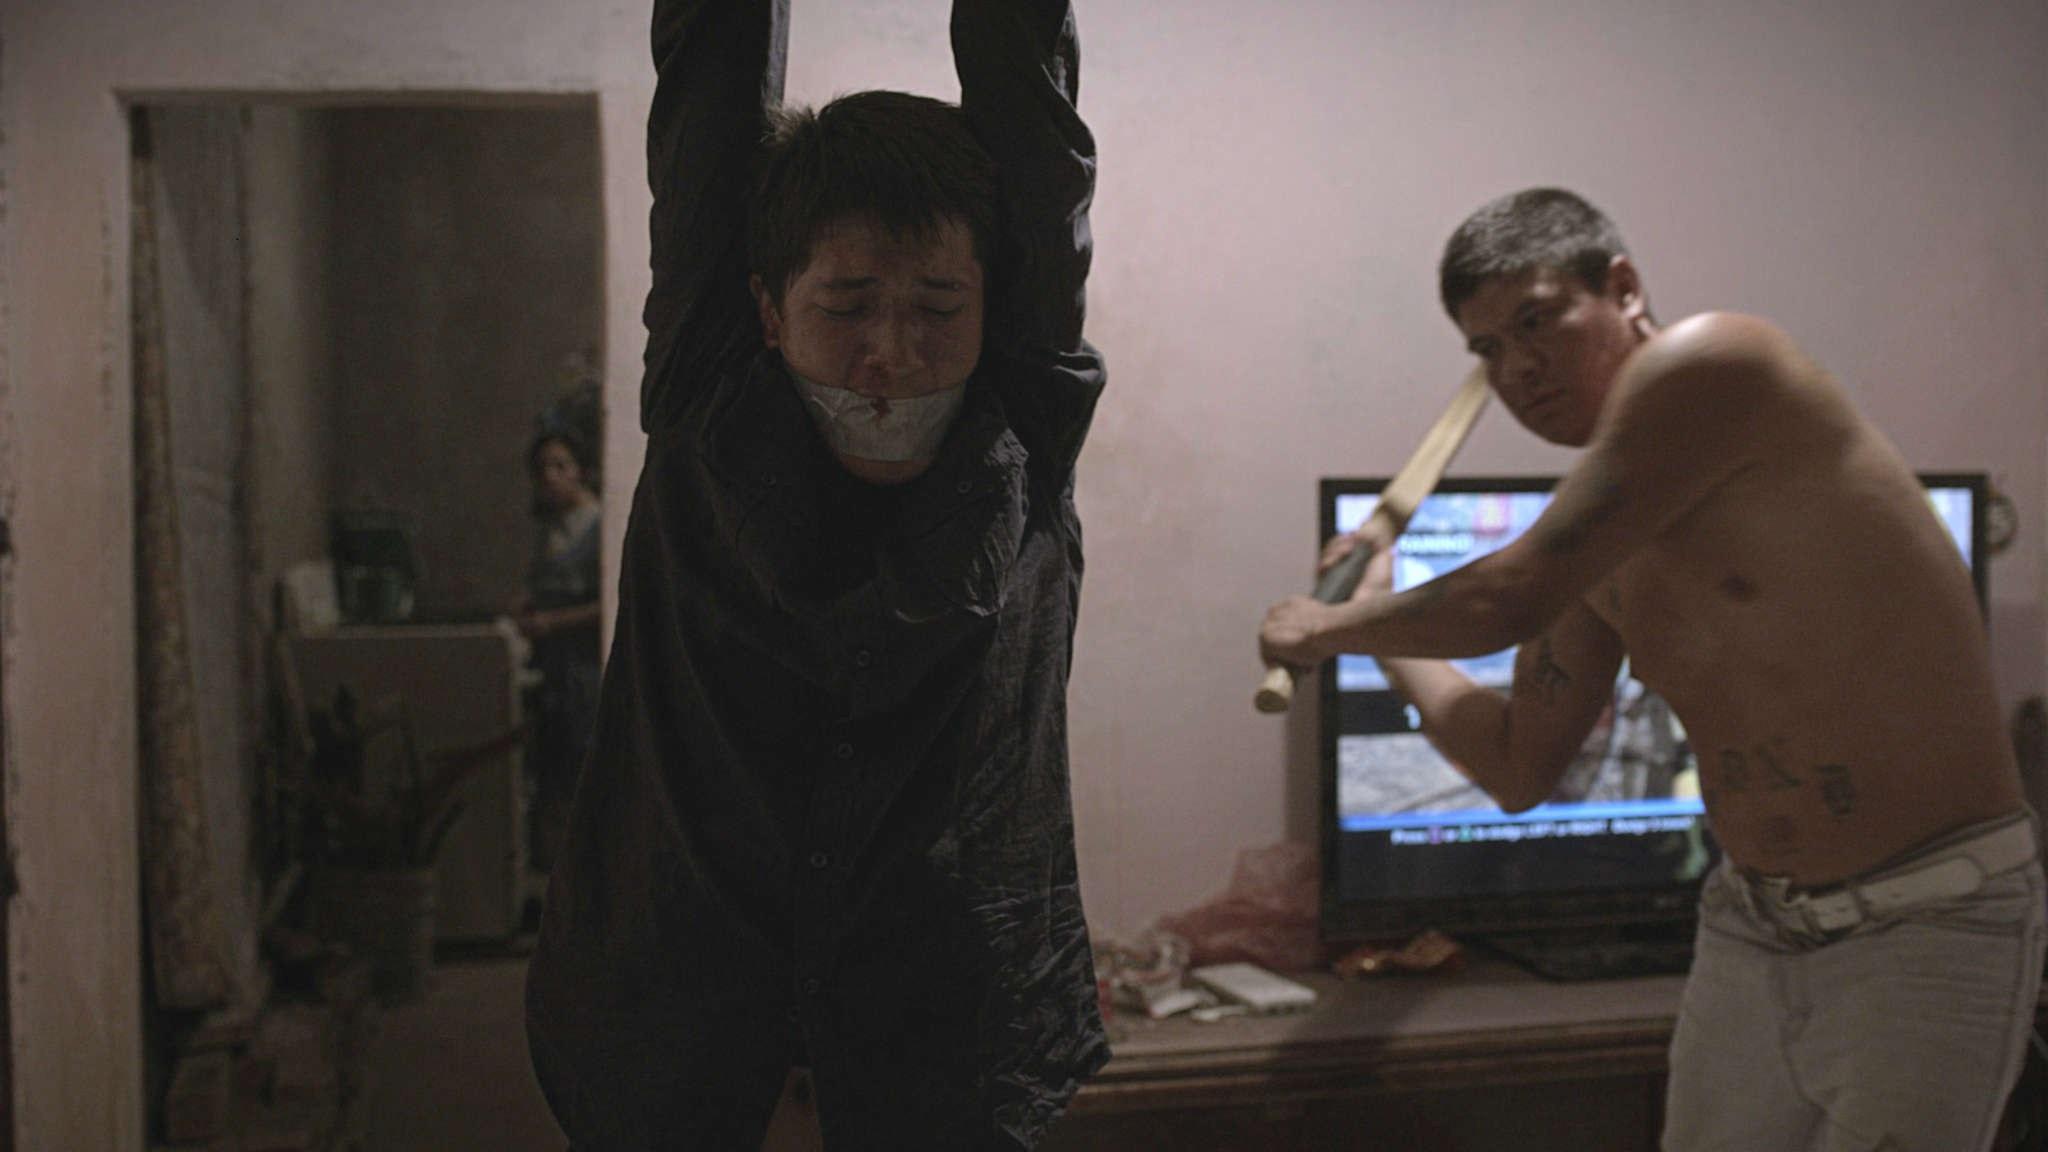 Mexikansk film - våld som terapi